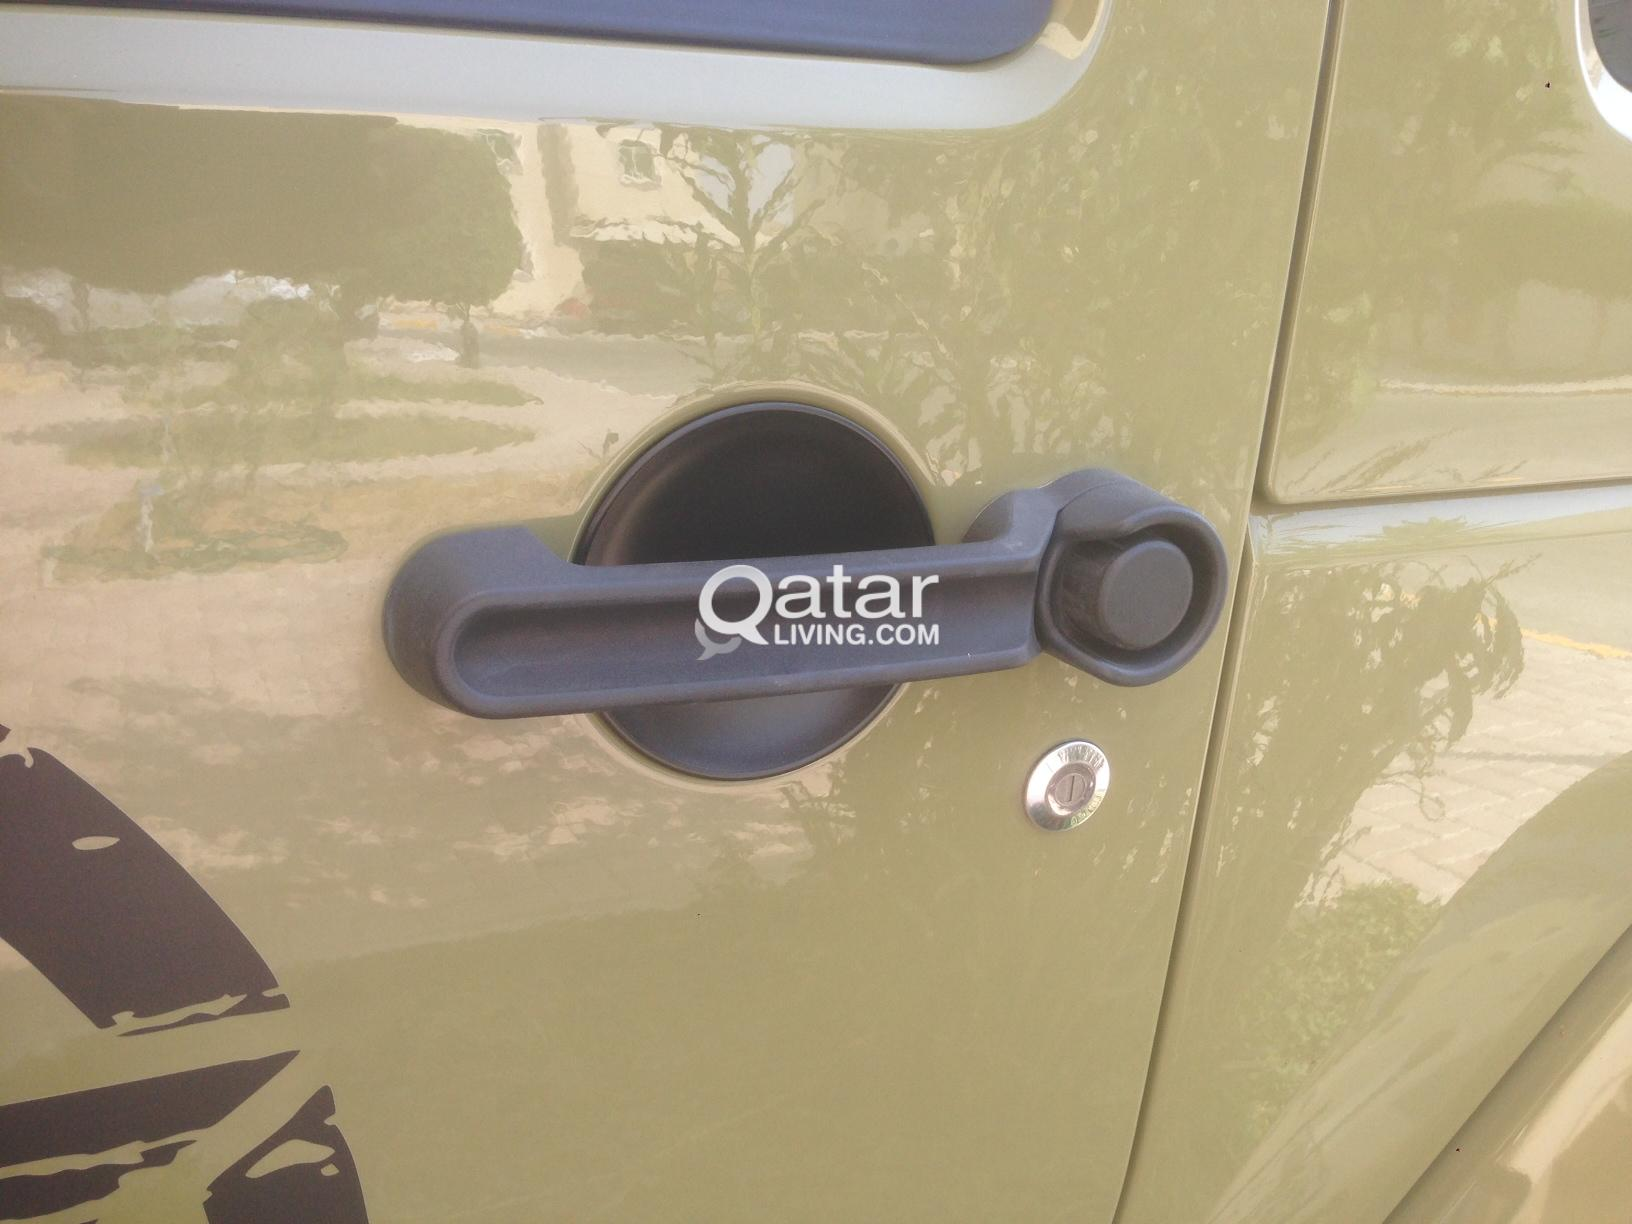 Jeep Wrangler Jk Auto Parts Qatar Living Door